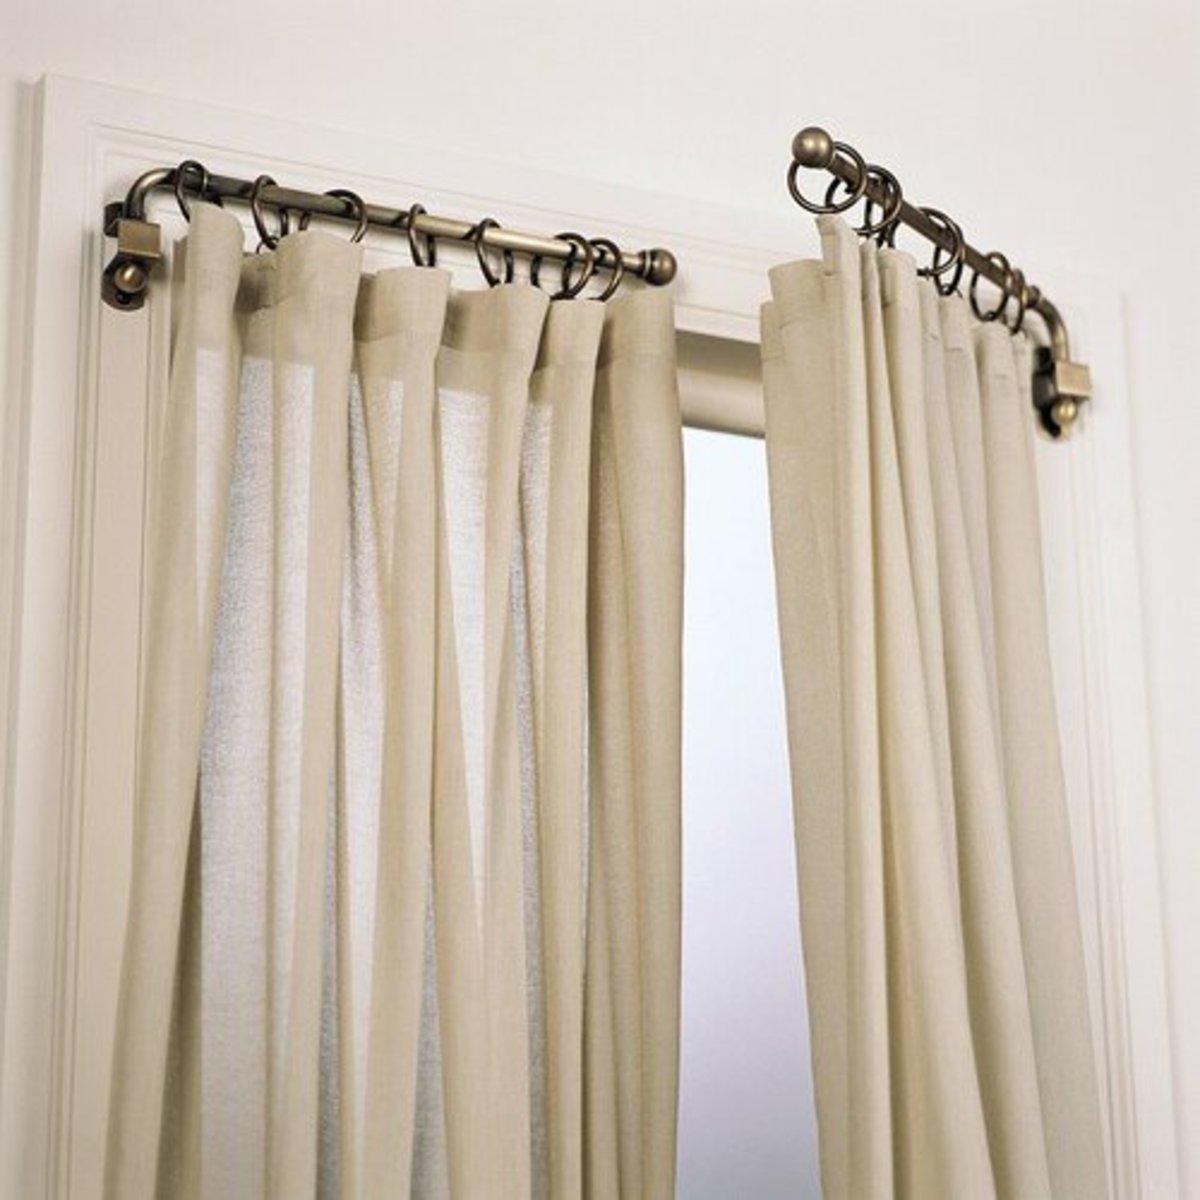 Understanding Different Curtain Rod Styles Dengarden Home And Garden